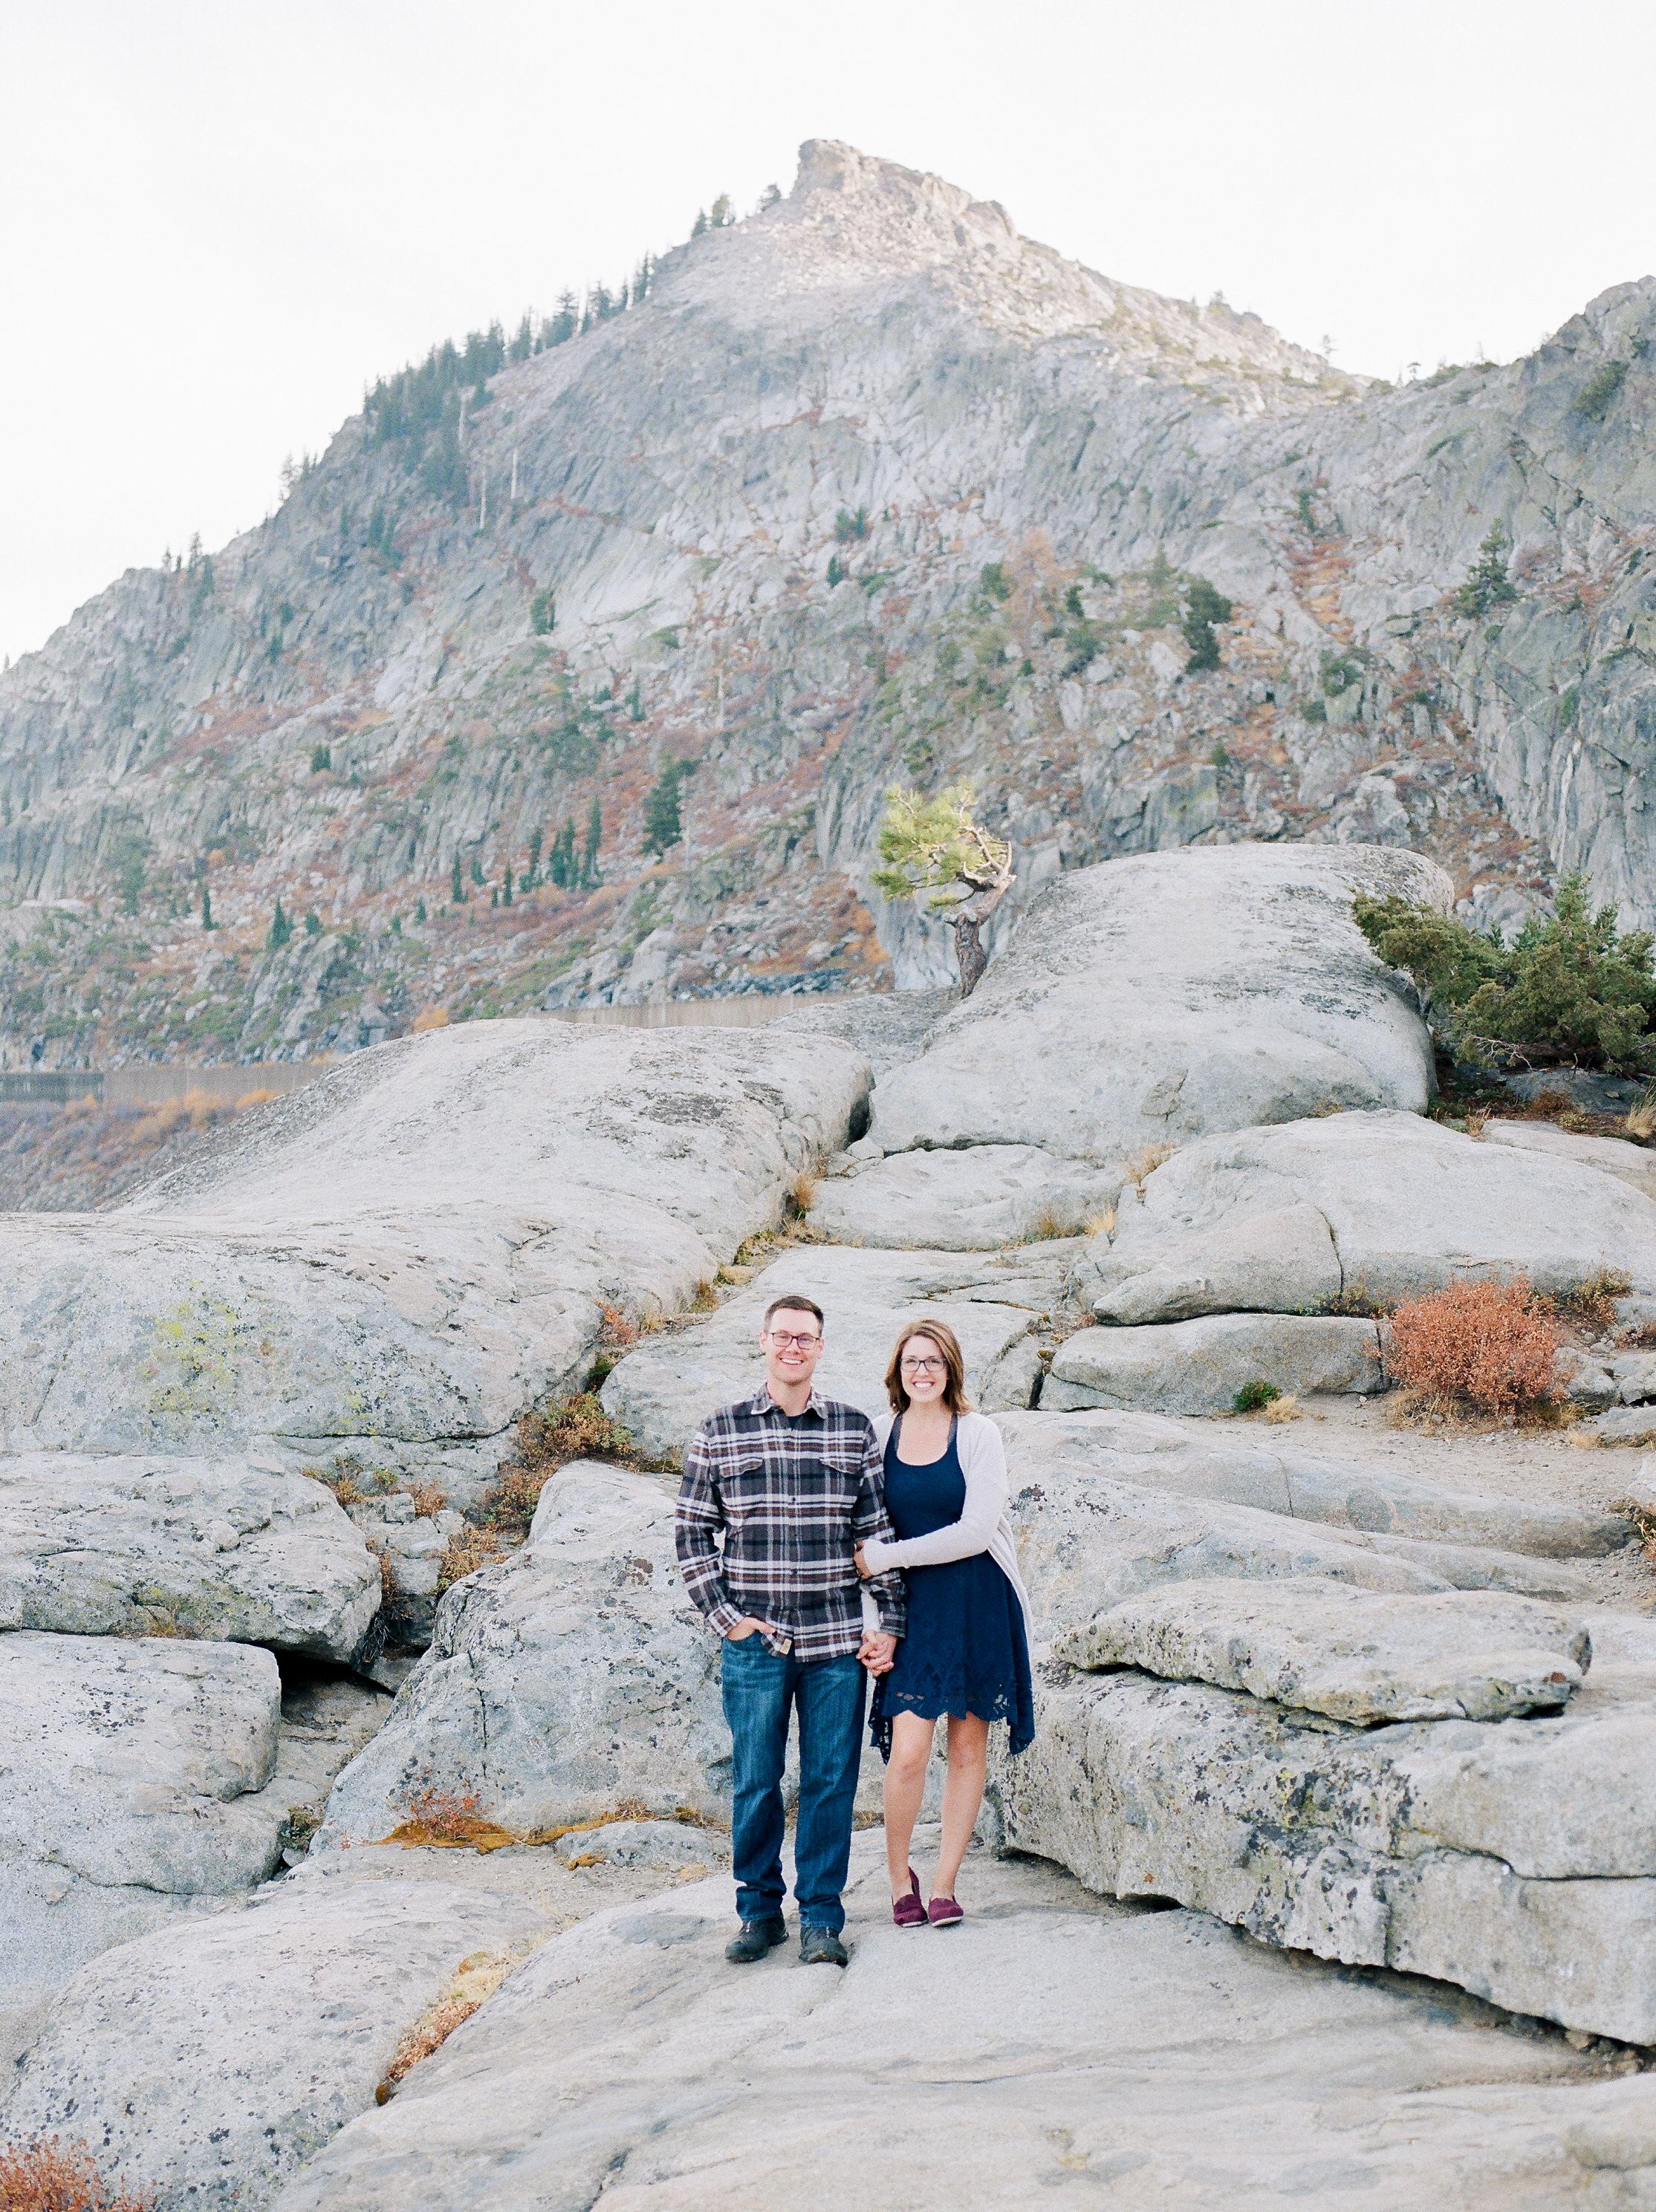 Donner-lake-adventure-photographer-captures-couple-on-wedding-annviersary (31 of).jpg